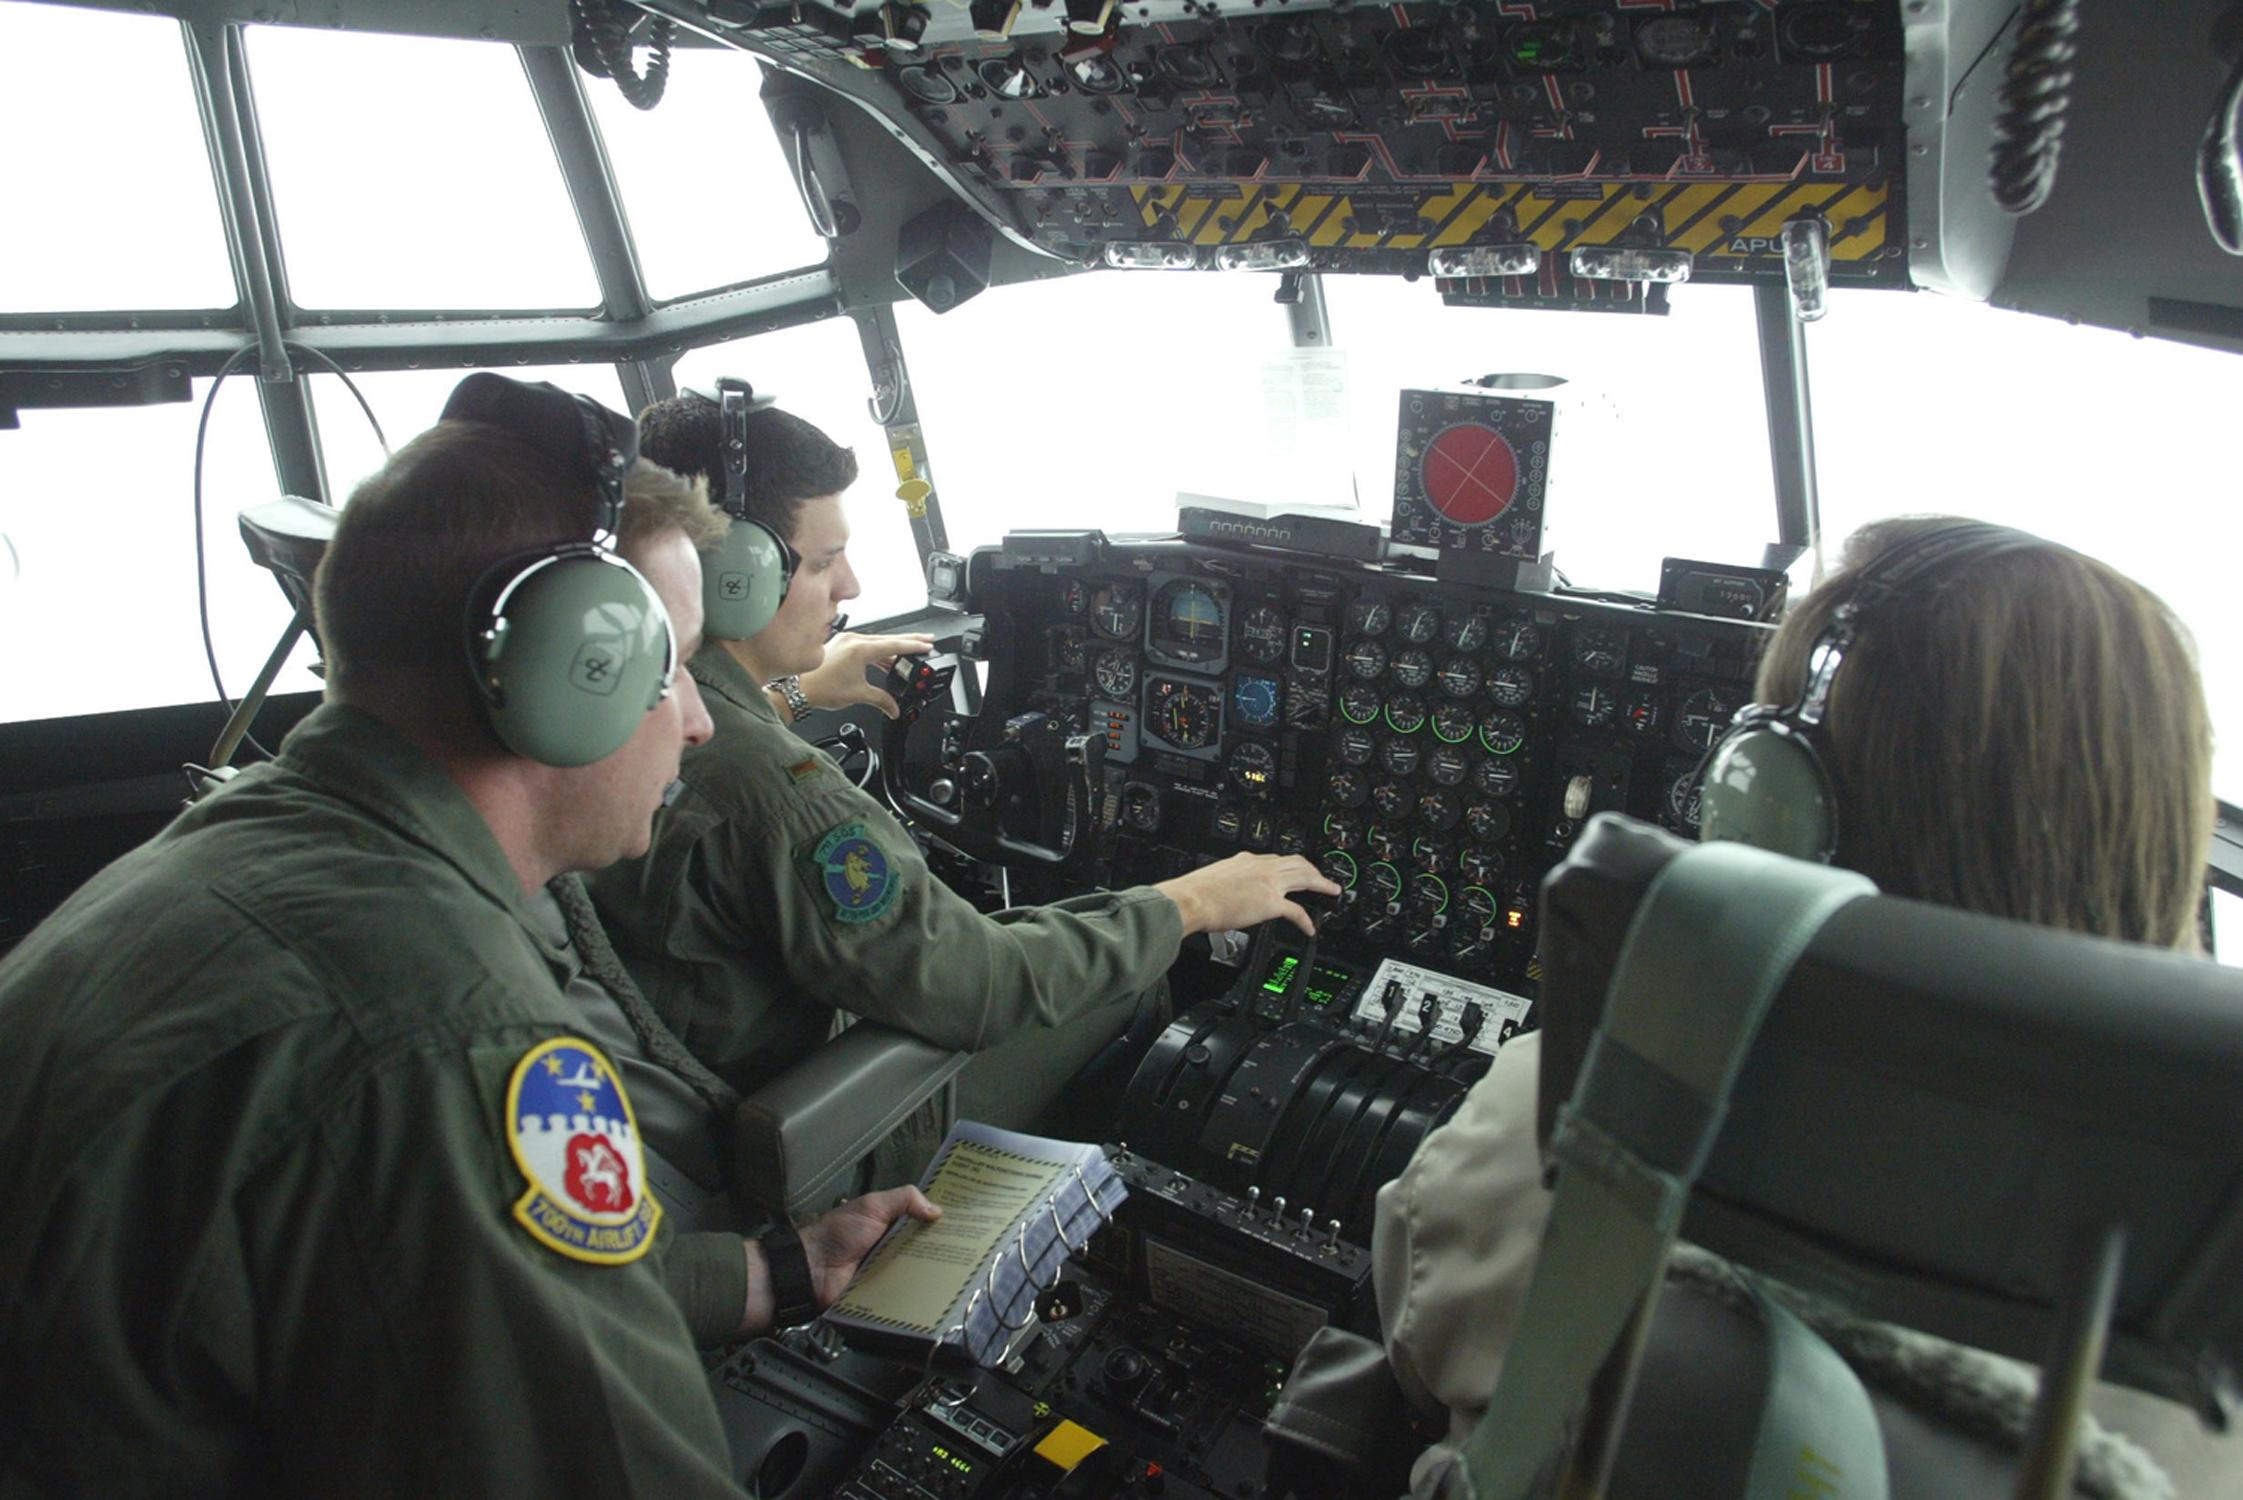 Dobbins Eastern Regional Flight Simulator flight training device